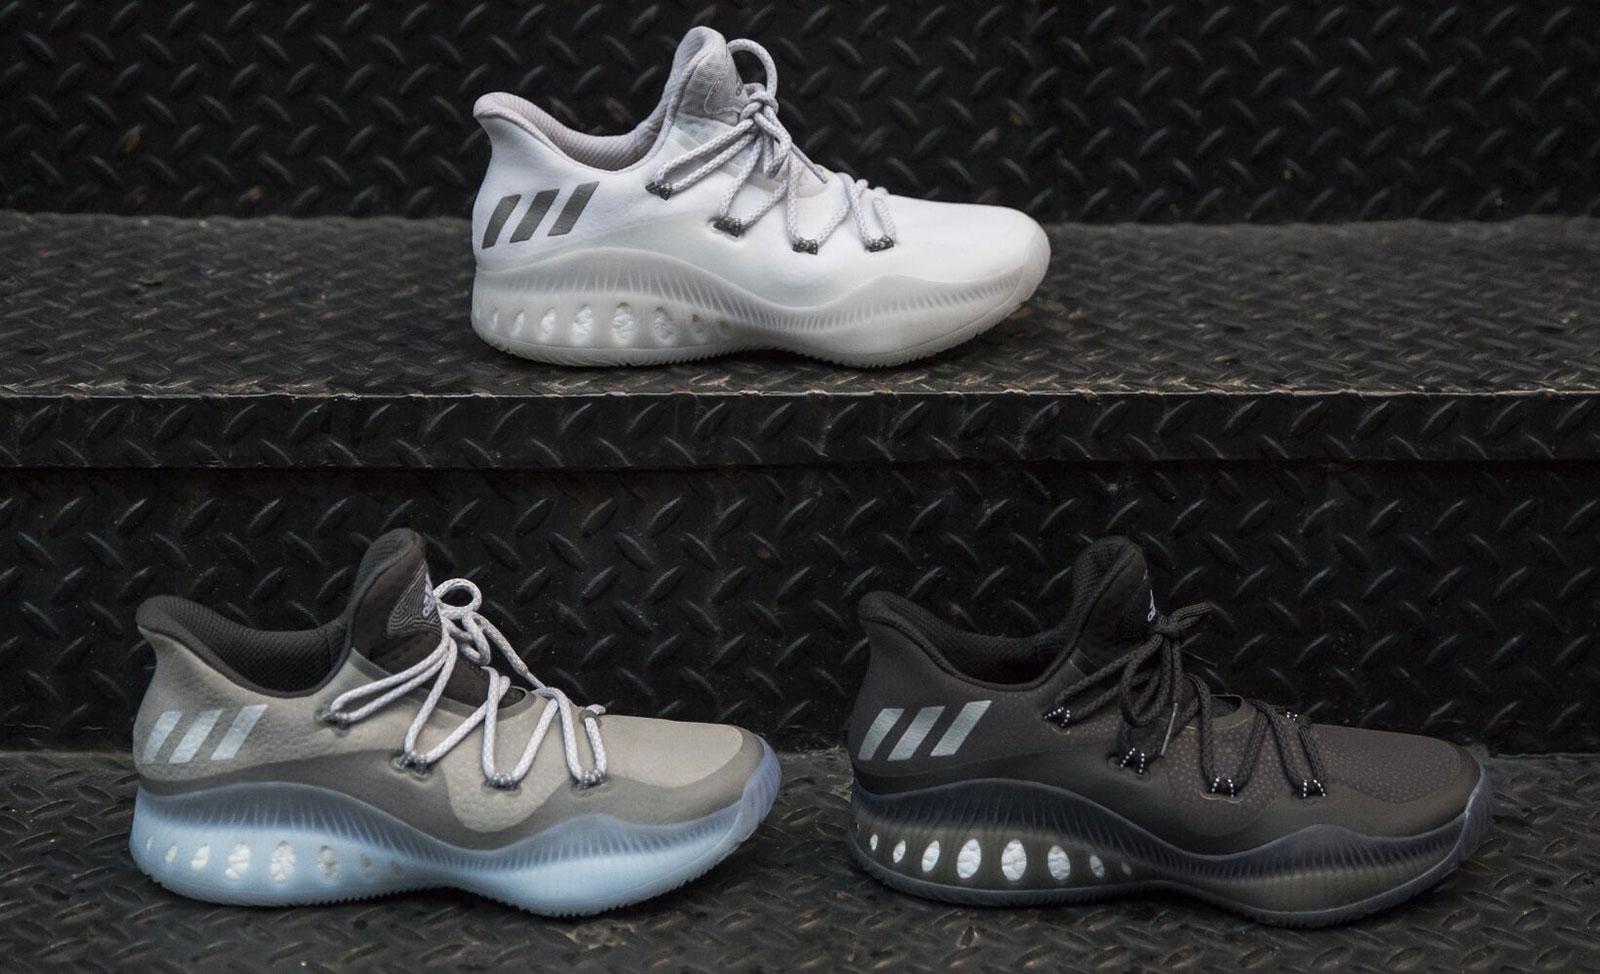 adidas-crazy-explosive-boost-low